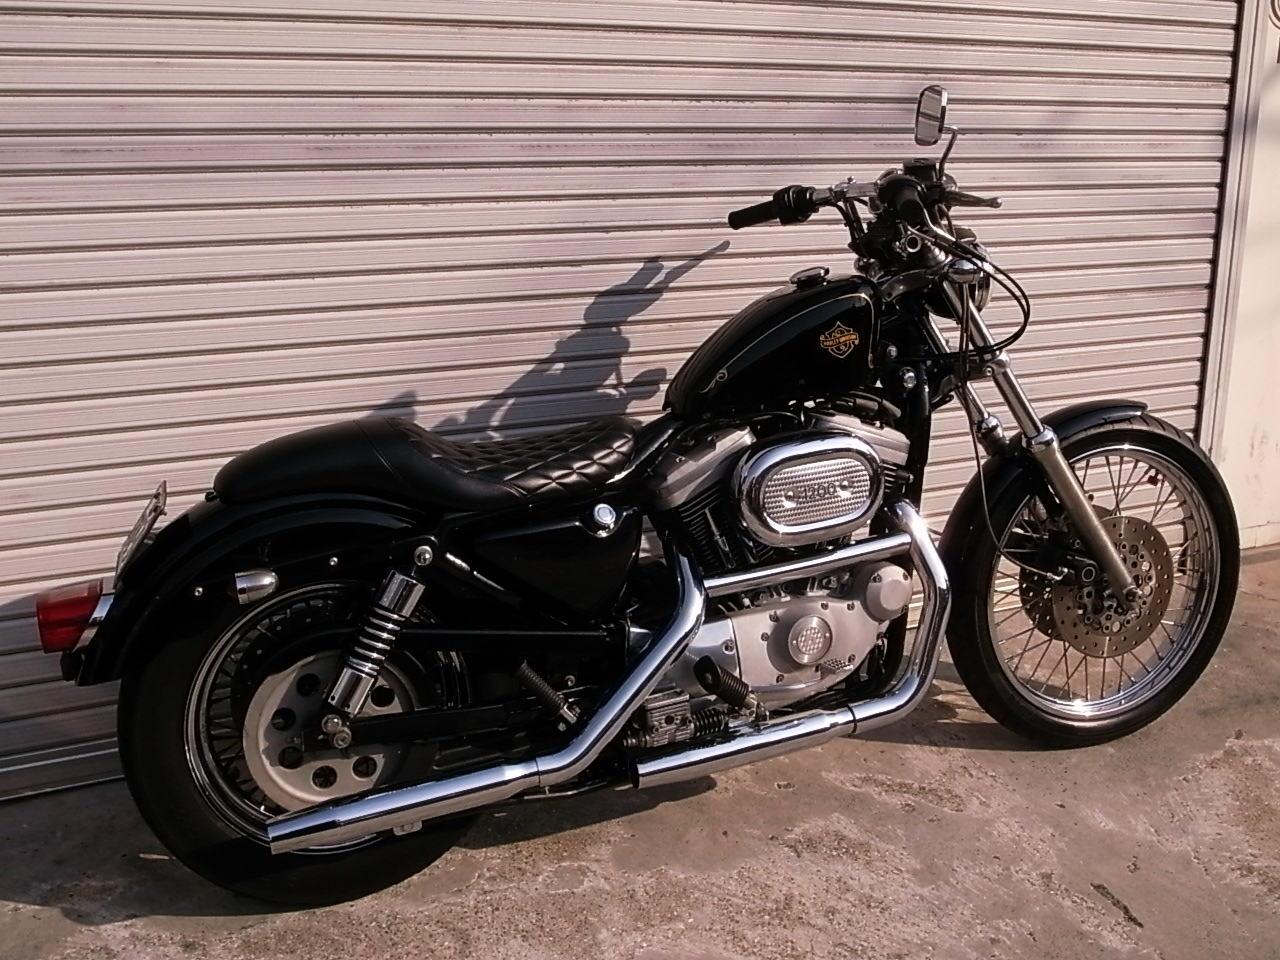 Harley Davidson XL1200S_b0160319_1328810.jpg